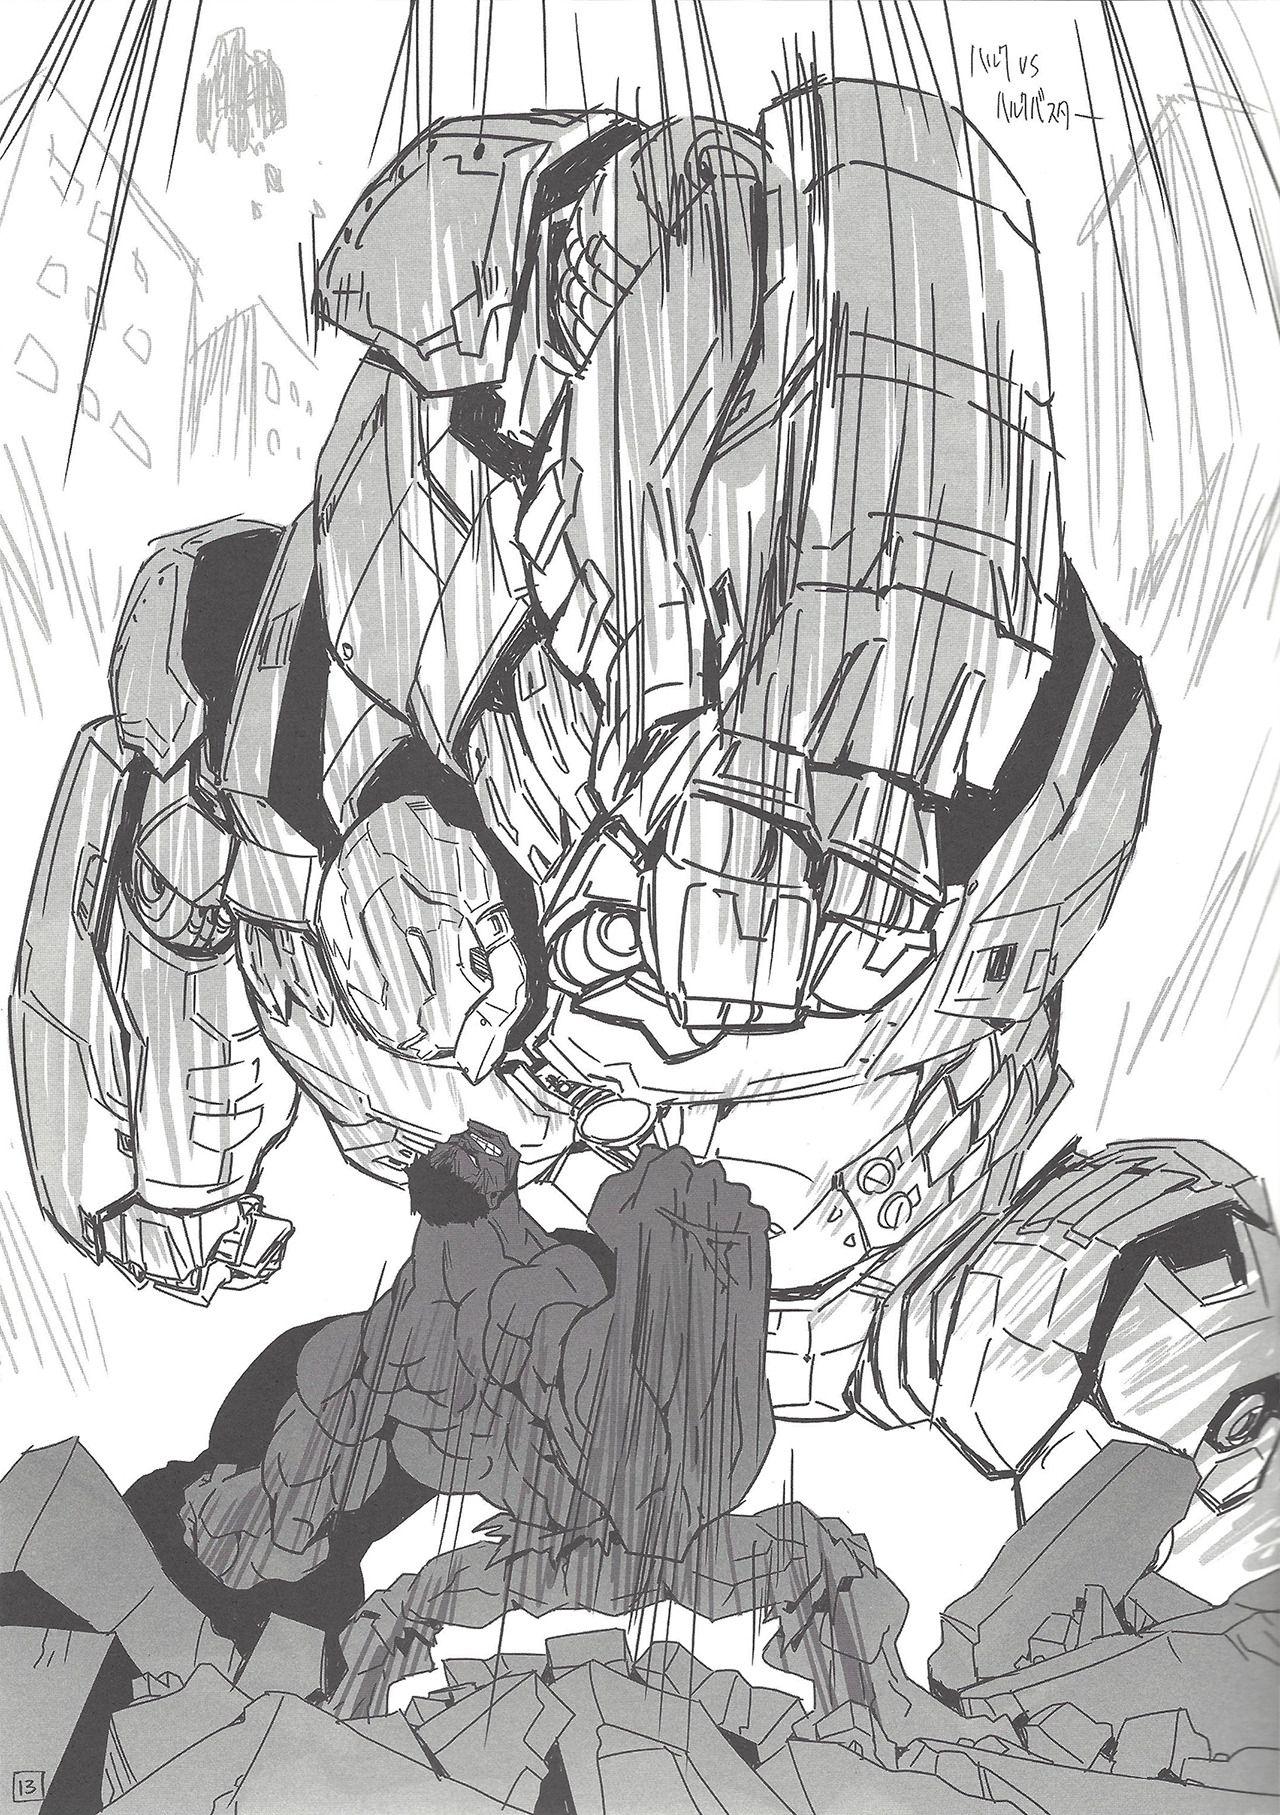 hiroyuki imaishi Tumblr Anime fight, Cartoon